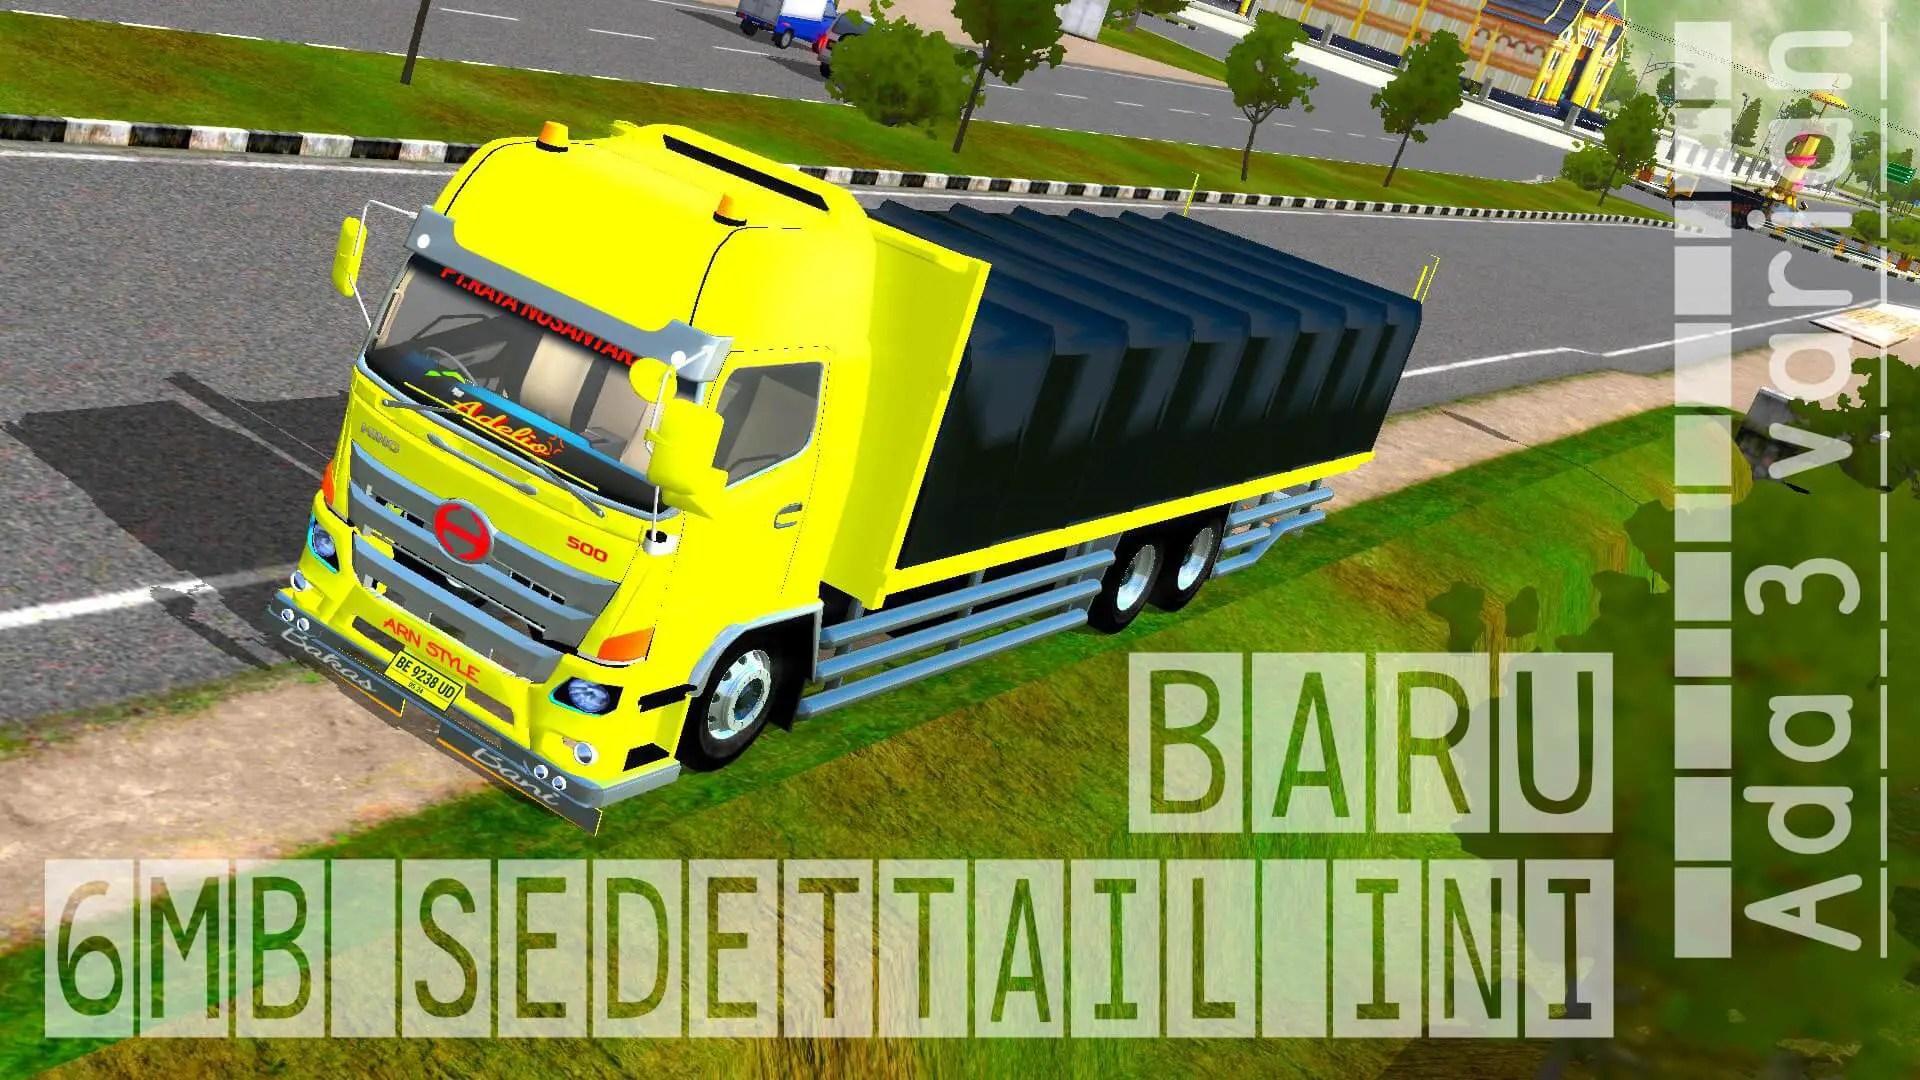 Download Hino HSD Losbak Semen Mod for Bus Simulator Indonesia, Hino HSD Losbak Semen, BUSSID mod, Hino HSD Losbak Semen, Hino HSD Mod for BUSSID, Hino Ranger Truck Mod, Mod BUSSID, Mod for BUSSID, SGCArena, Truck Mod for BUSSID, Vehicle Mod